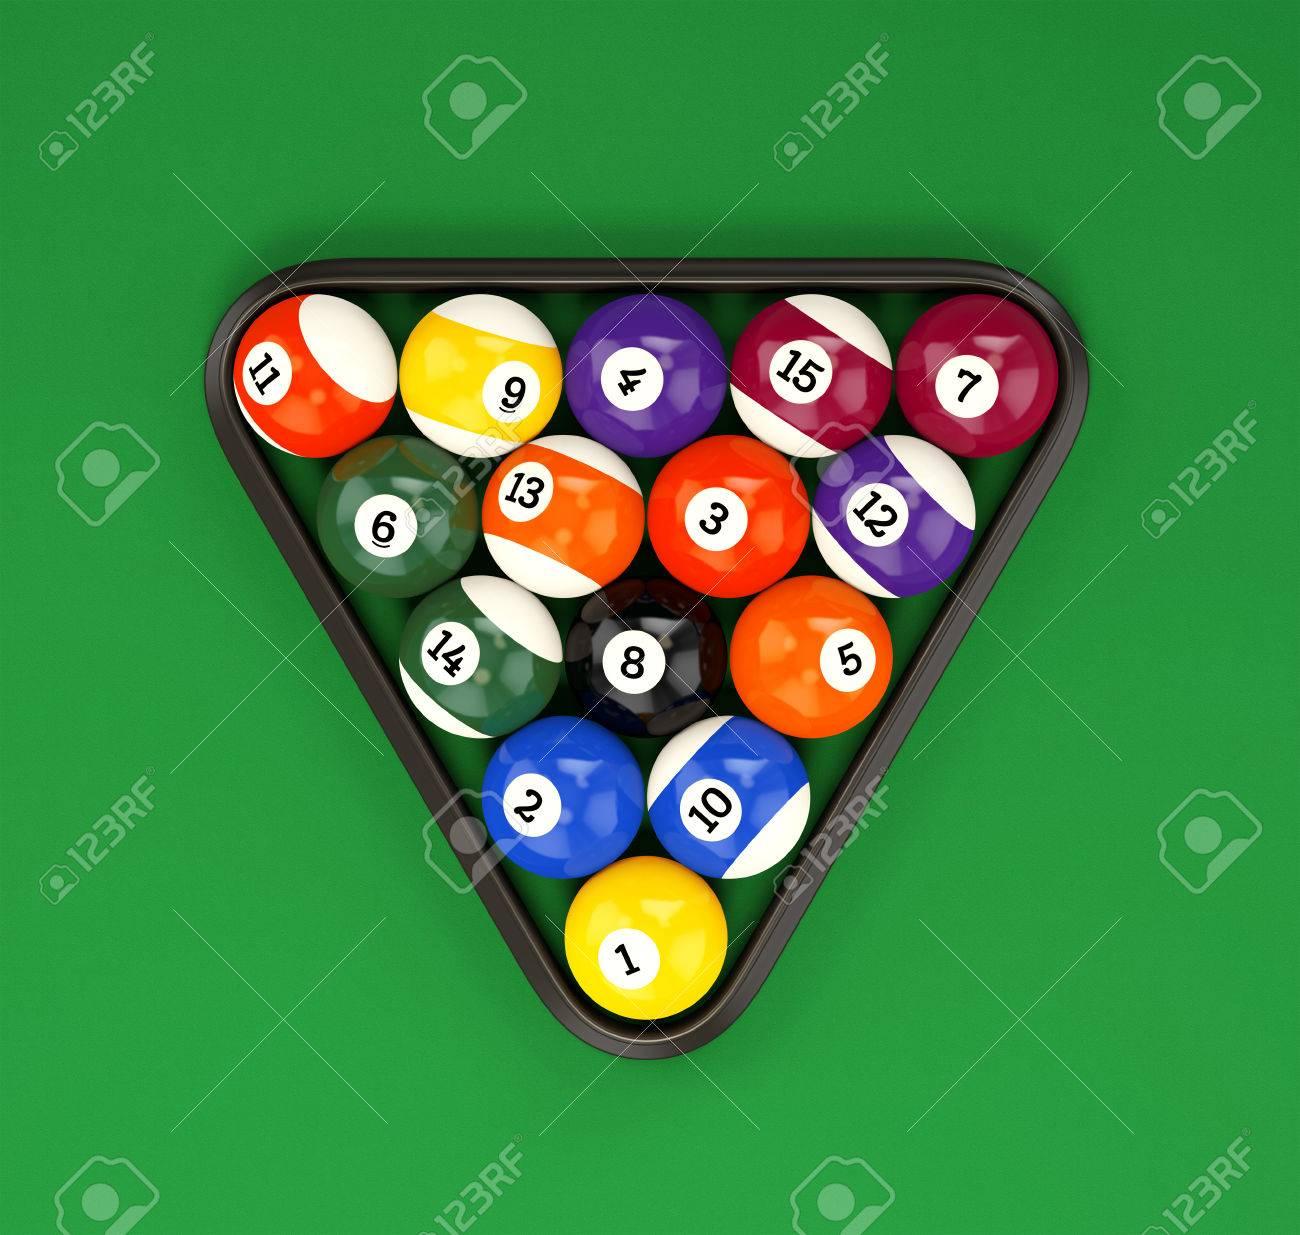 Pool Ball Pyramid On Green Billiard Table Cloth. Group Of Glossy Colorful  Retro Game Balls